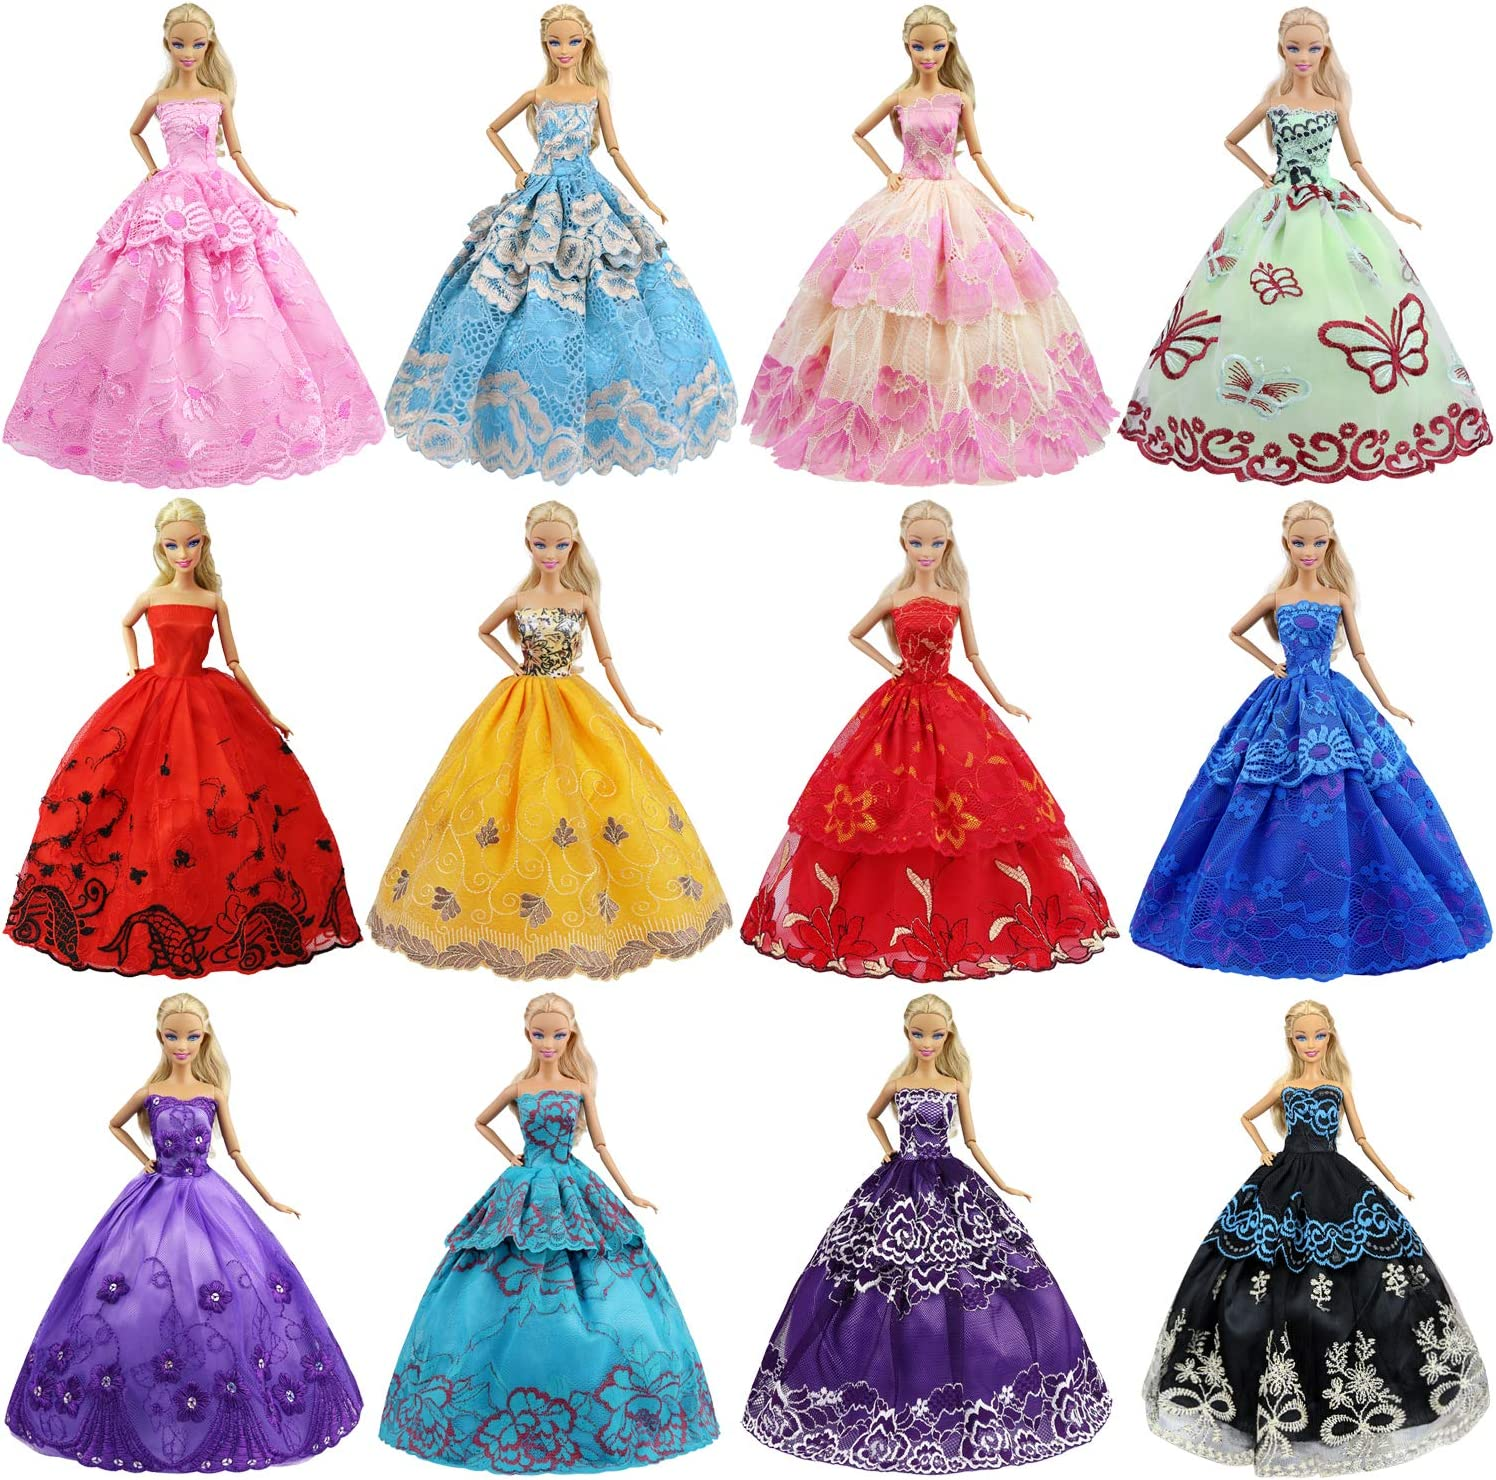 Amazon.com: ZITA ELEMENT Lot 6 Pcs 11.5 Inch Girl Doll Party Dress